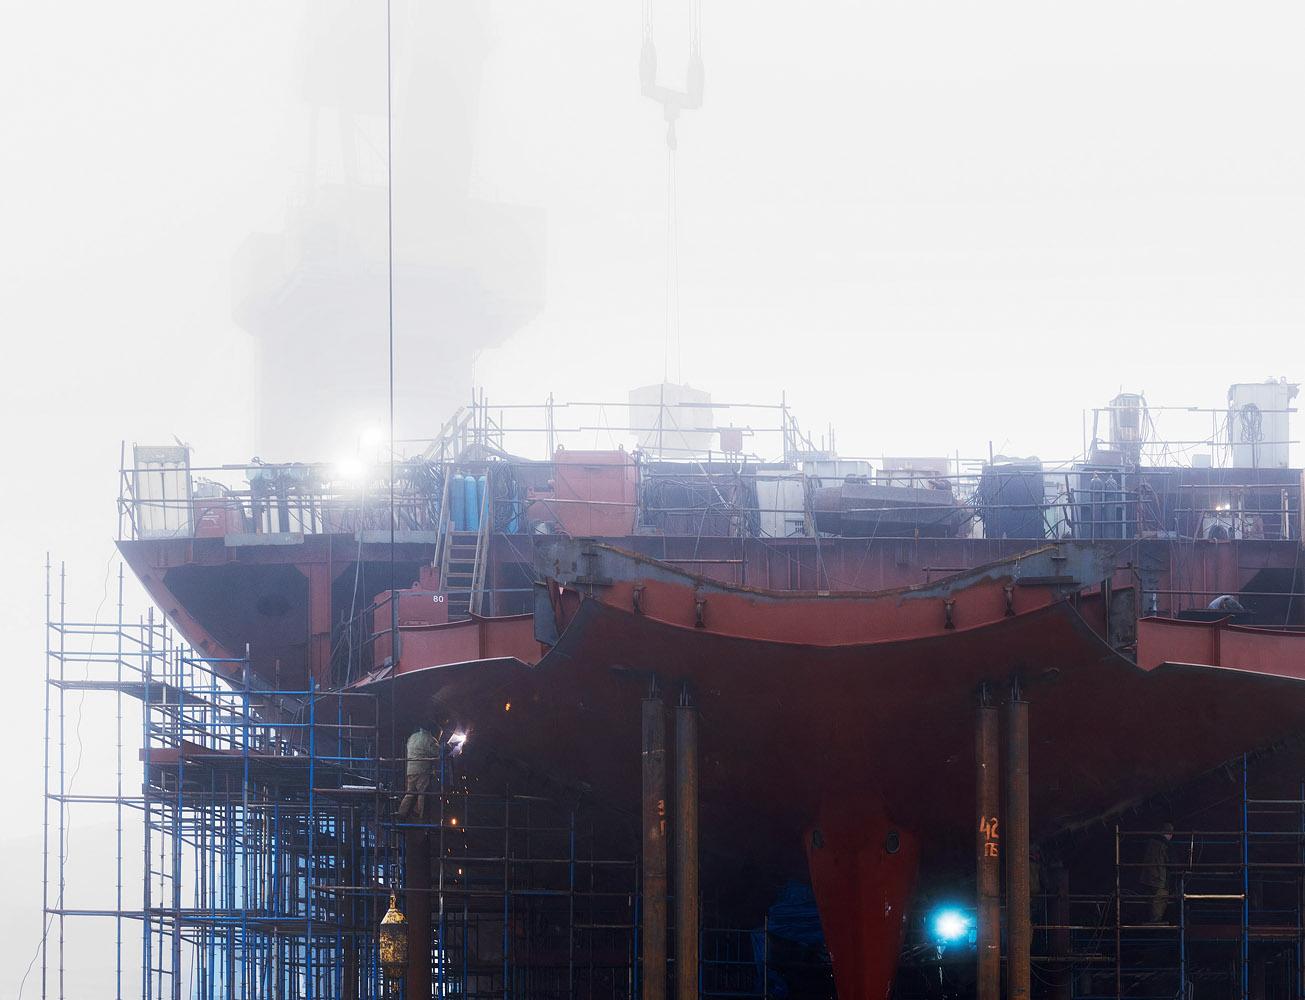 ПАО Балтийский завод